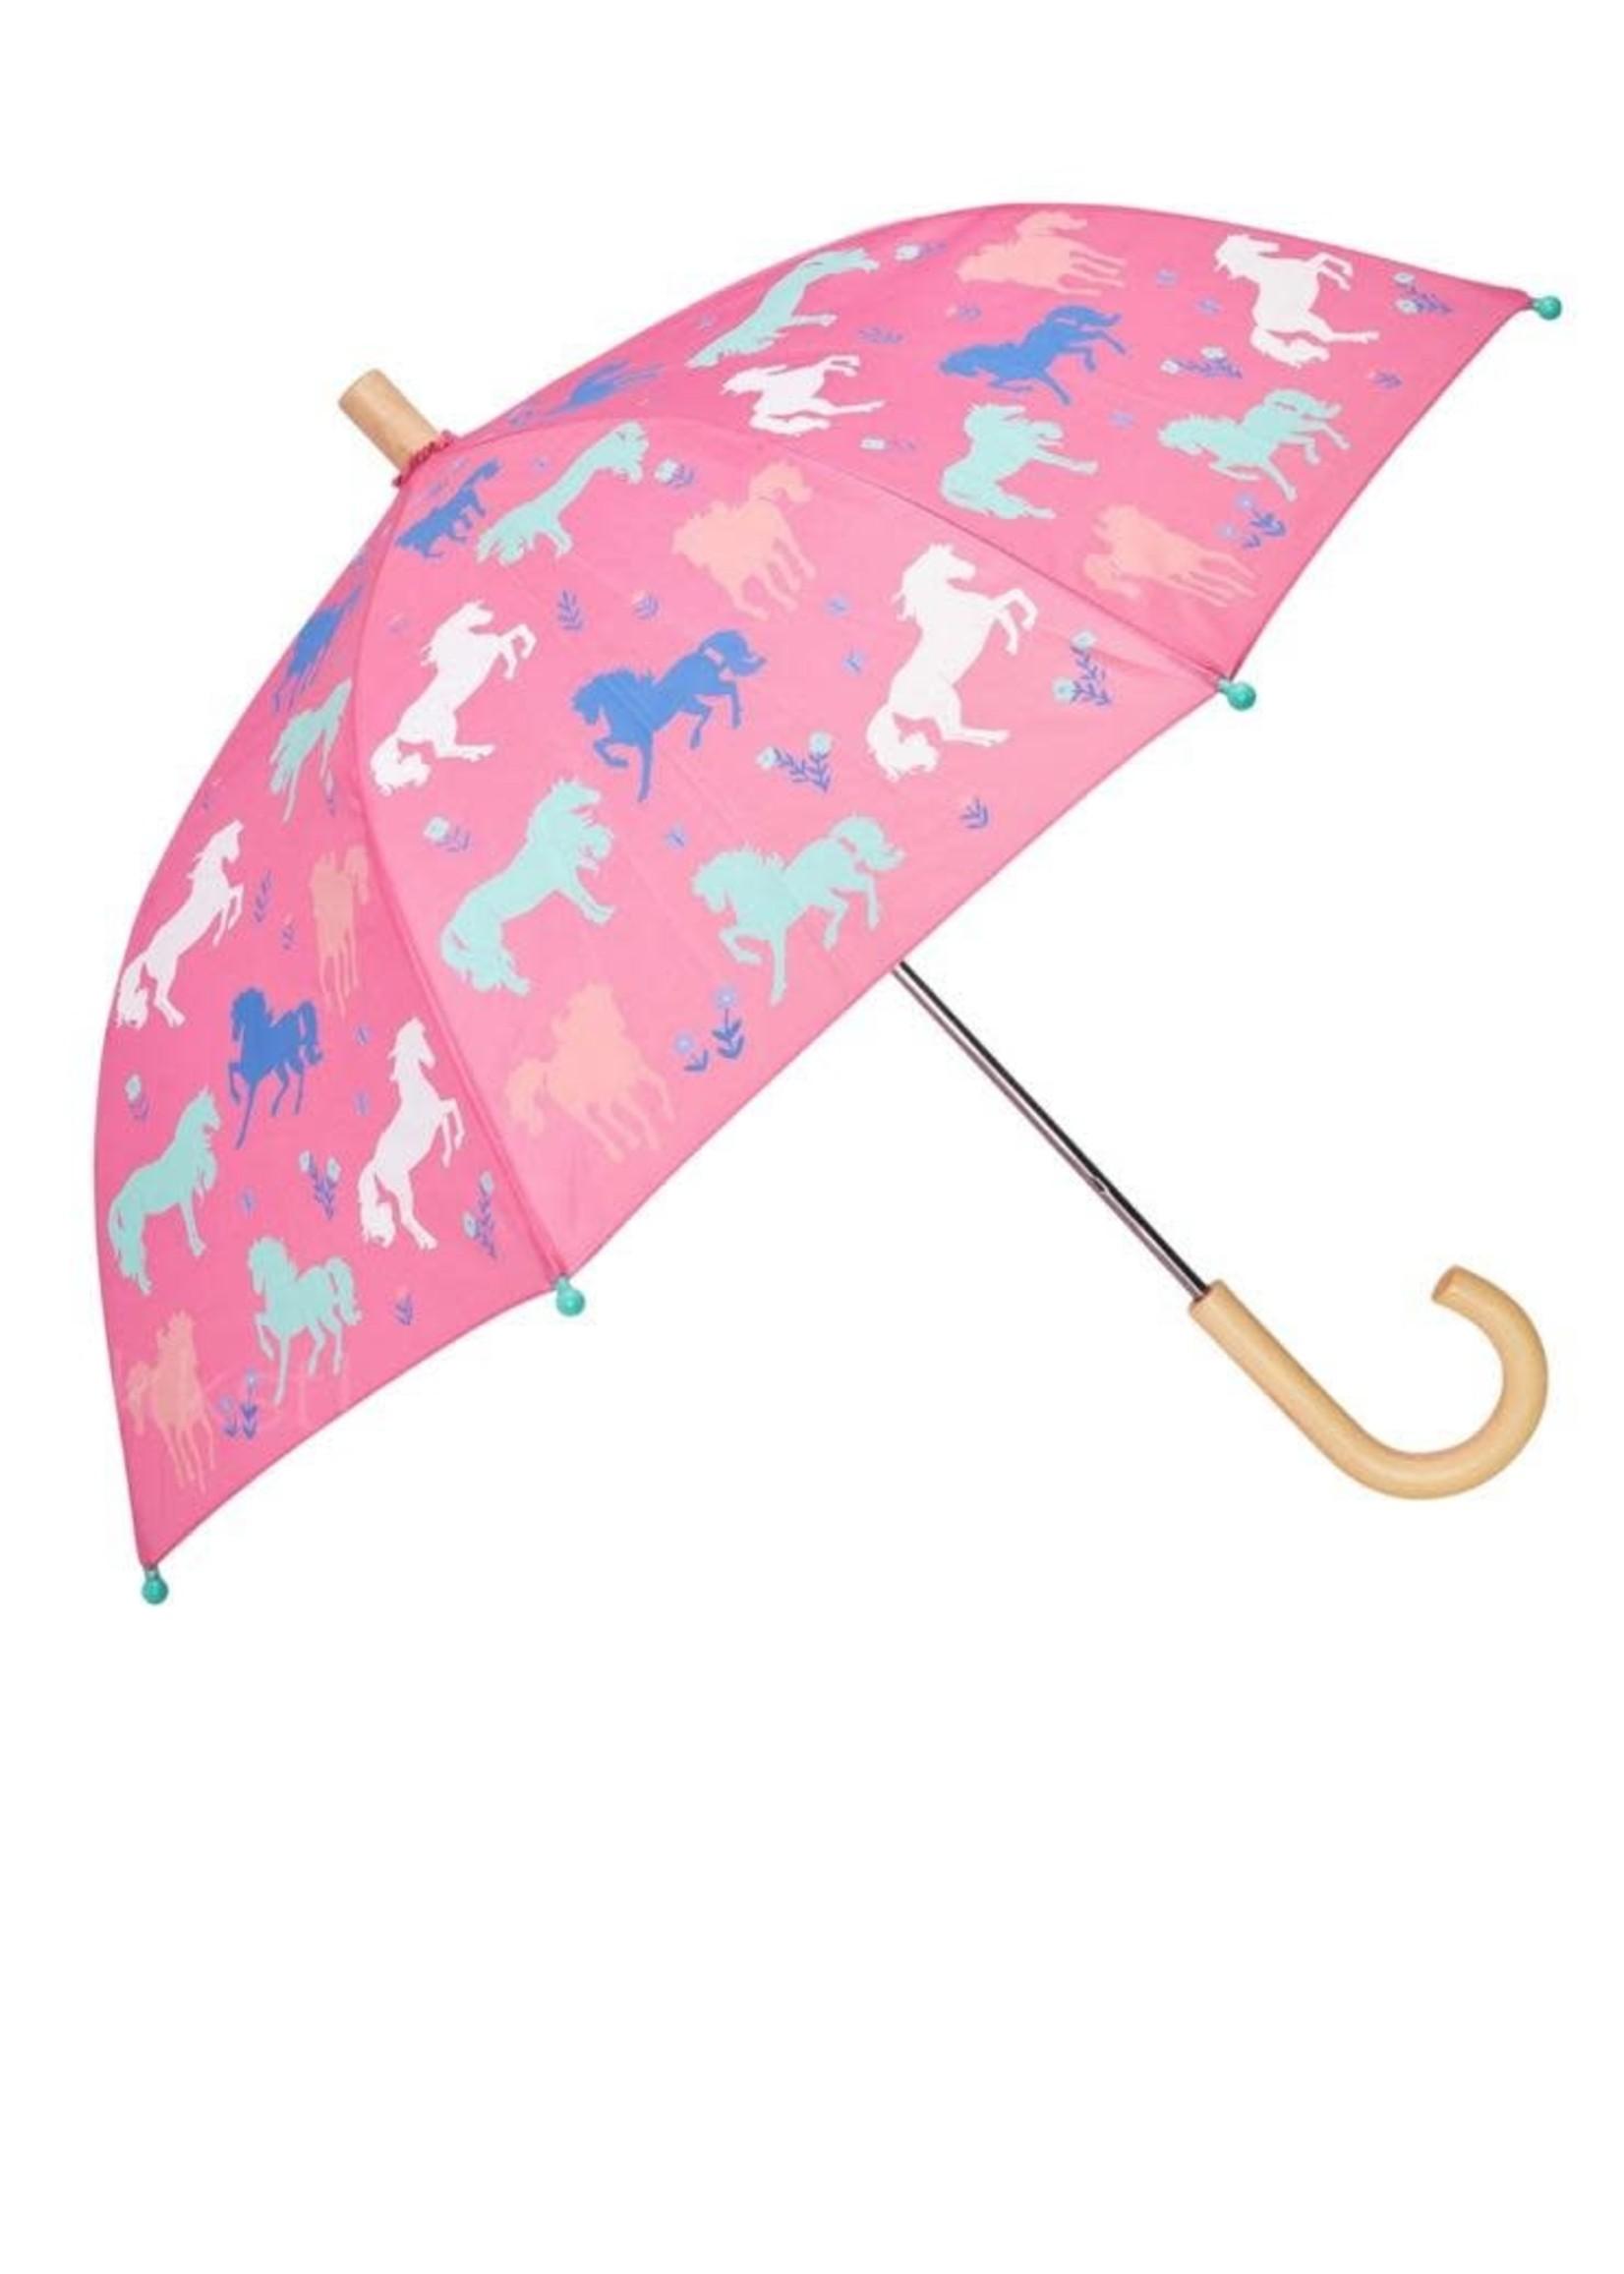 Hatley Hatley, Painted Pasture Umbrella